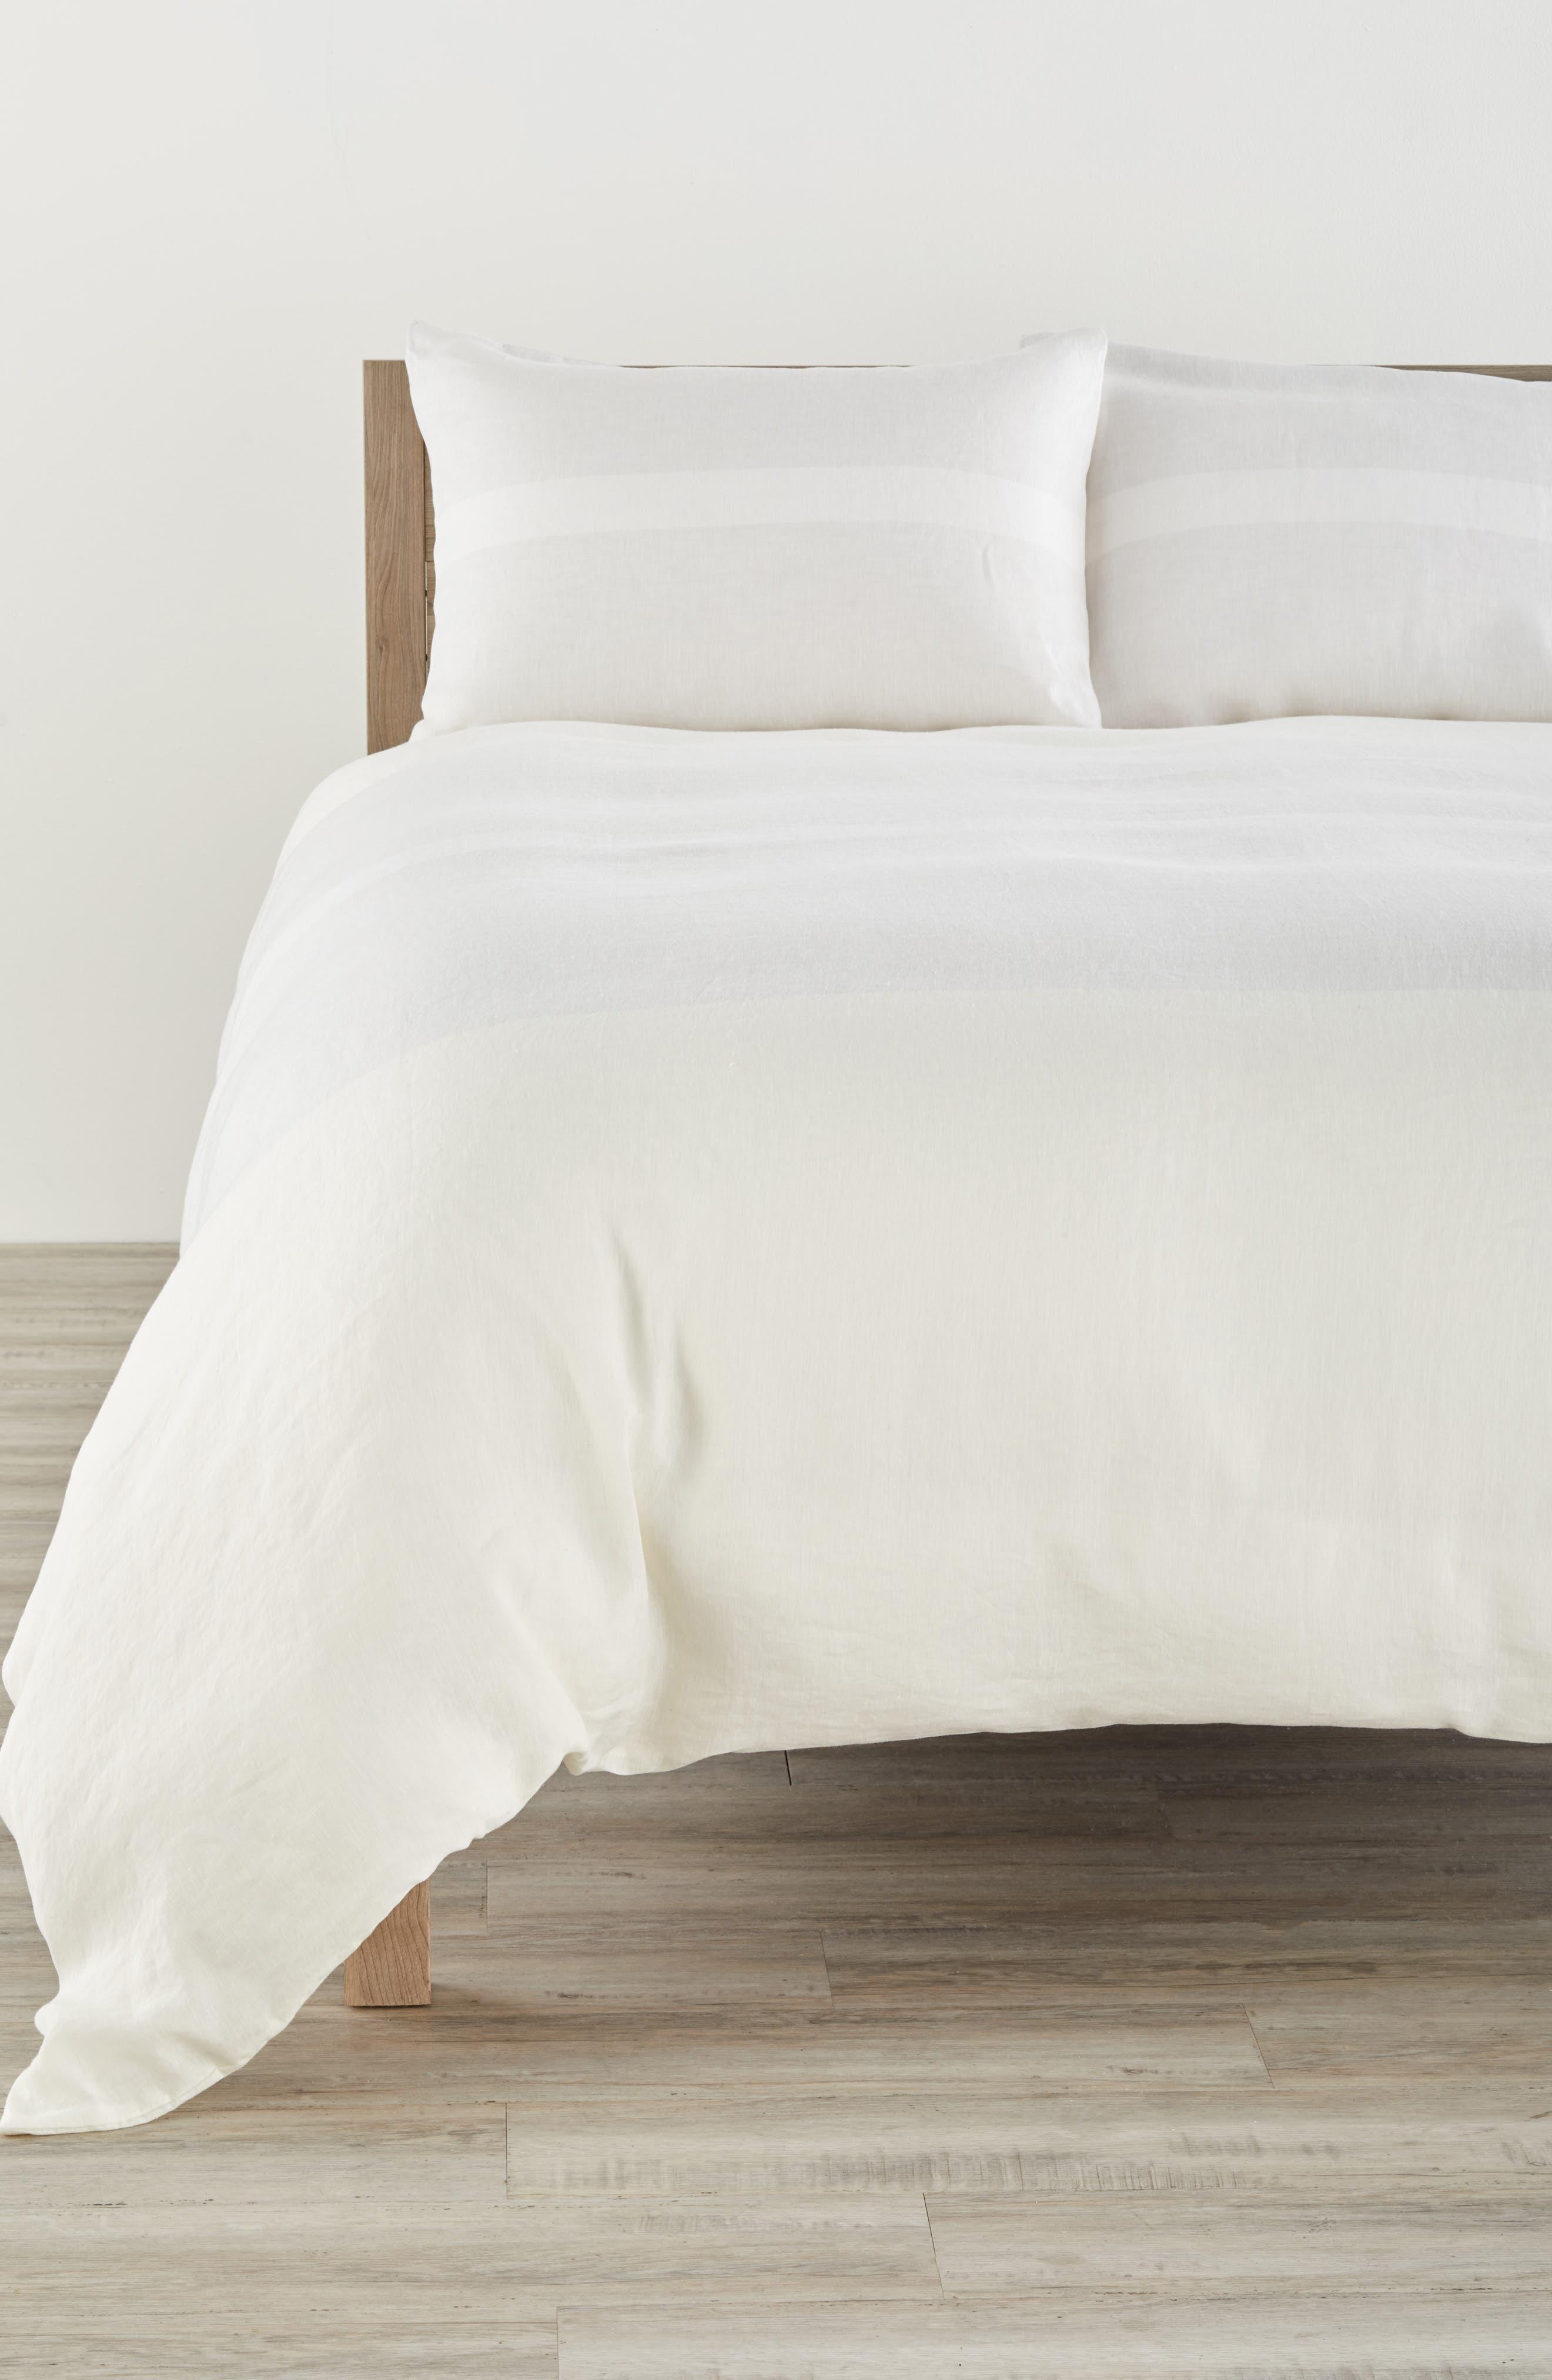 Solo 580 Thread Count Linen Duvet Cover,                         Main,                         color, Anvil